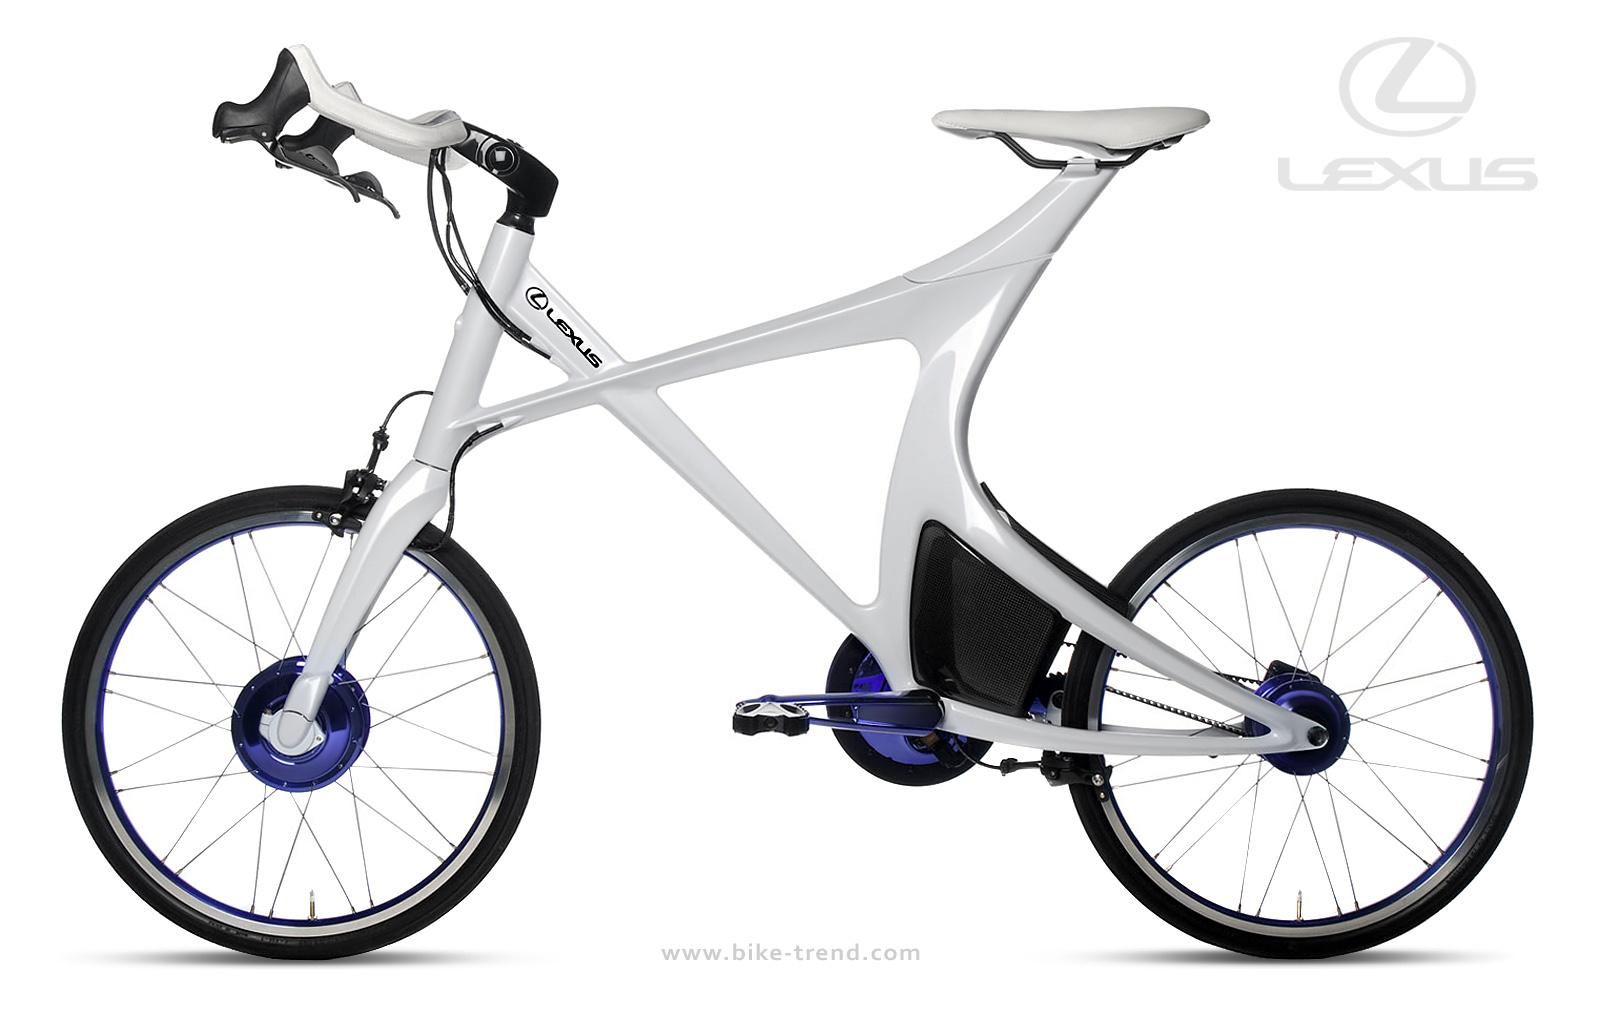 Lexus HB Concept Hybrid Bike